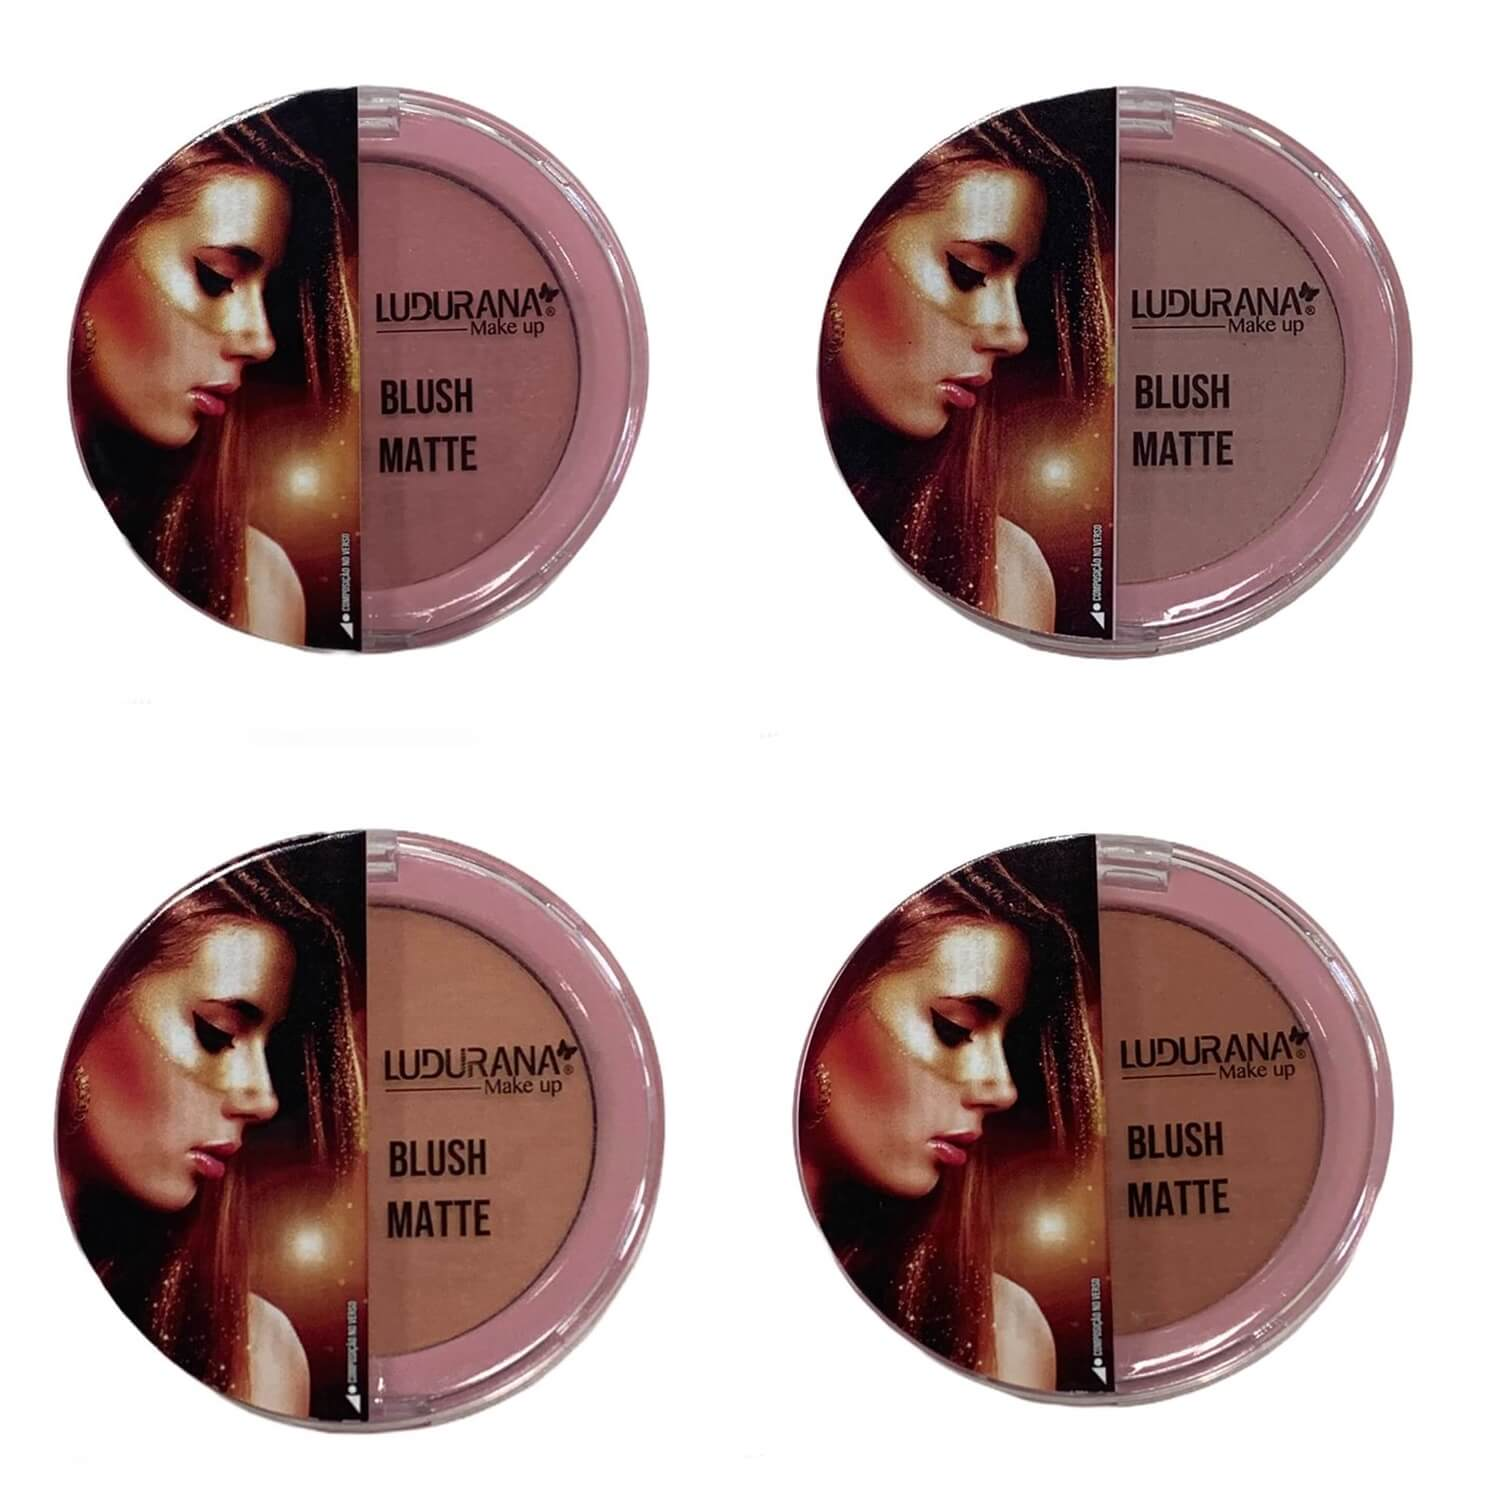 Blush Matte - Ludurana Make Up